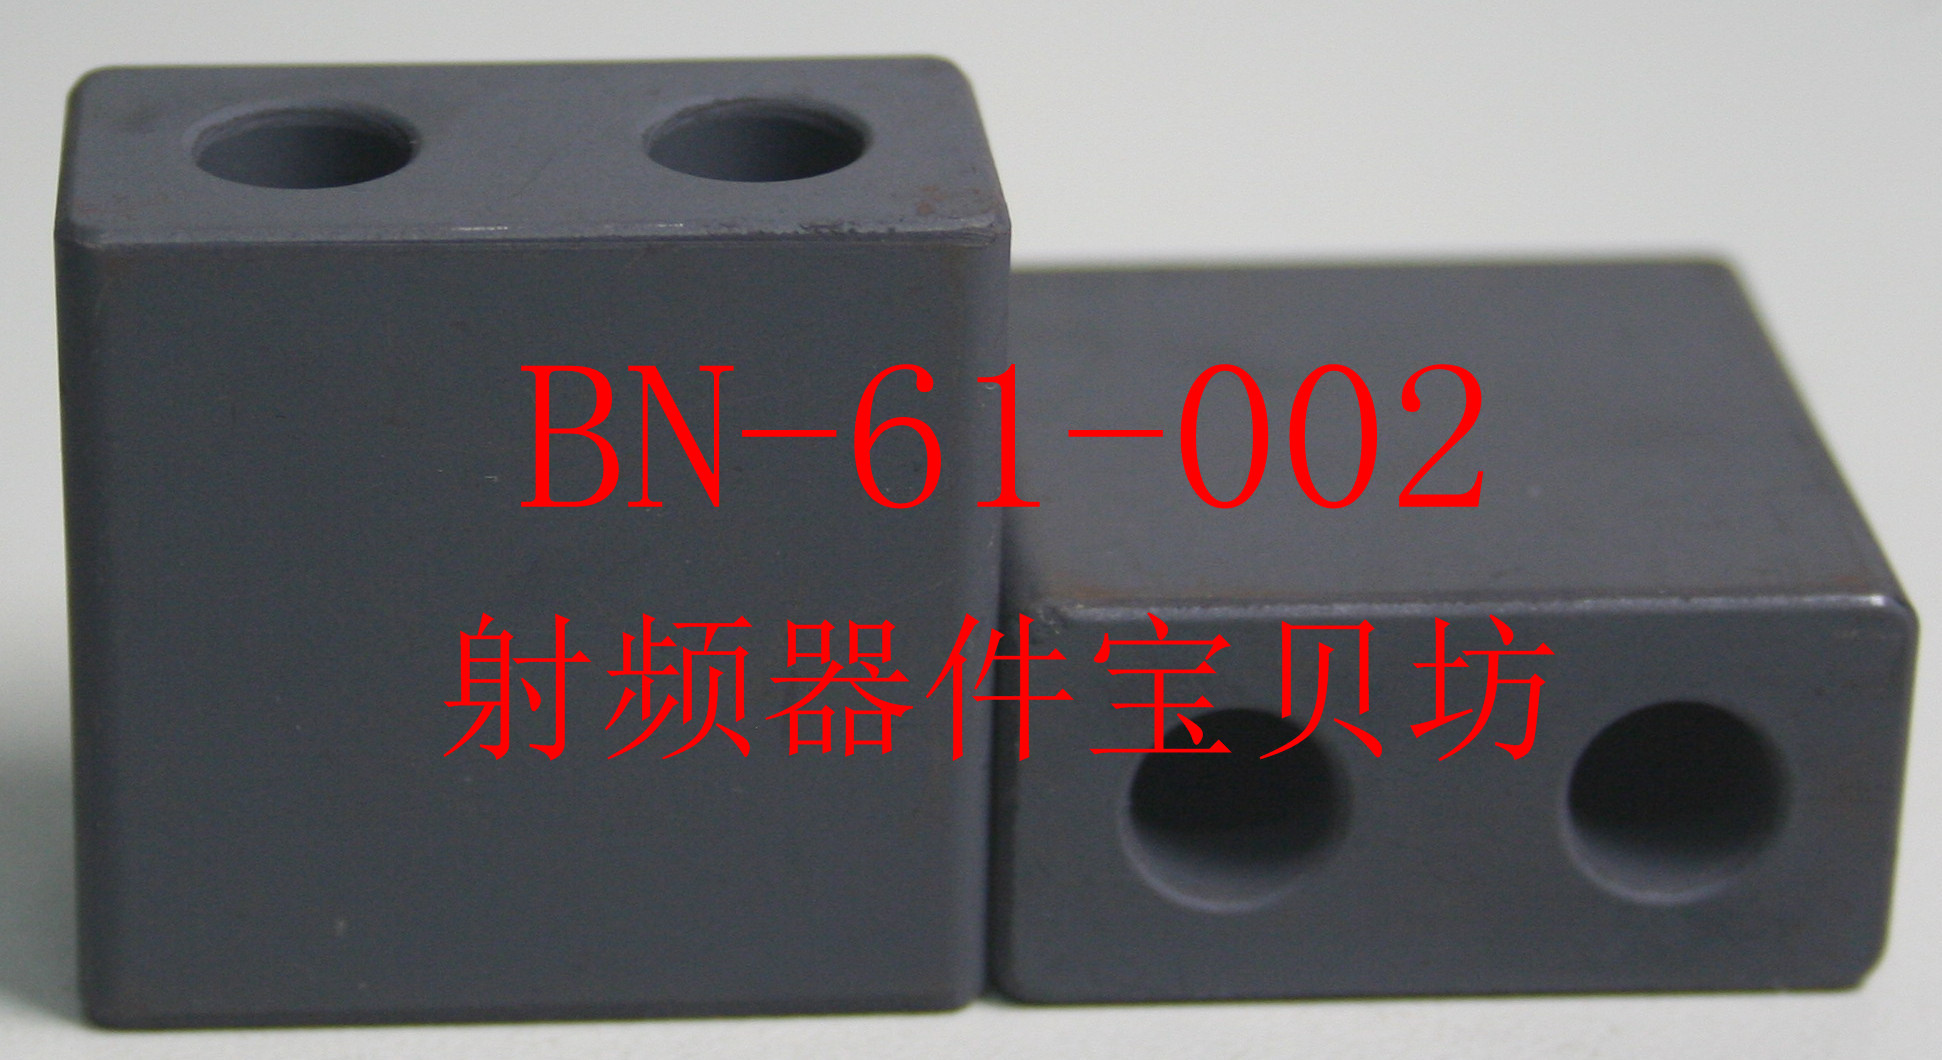 American RF Double-hole Ferrite Core: BN-61-002